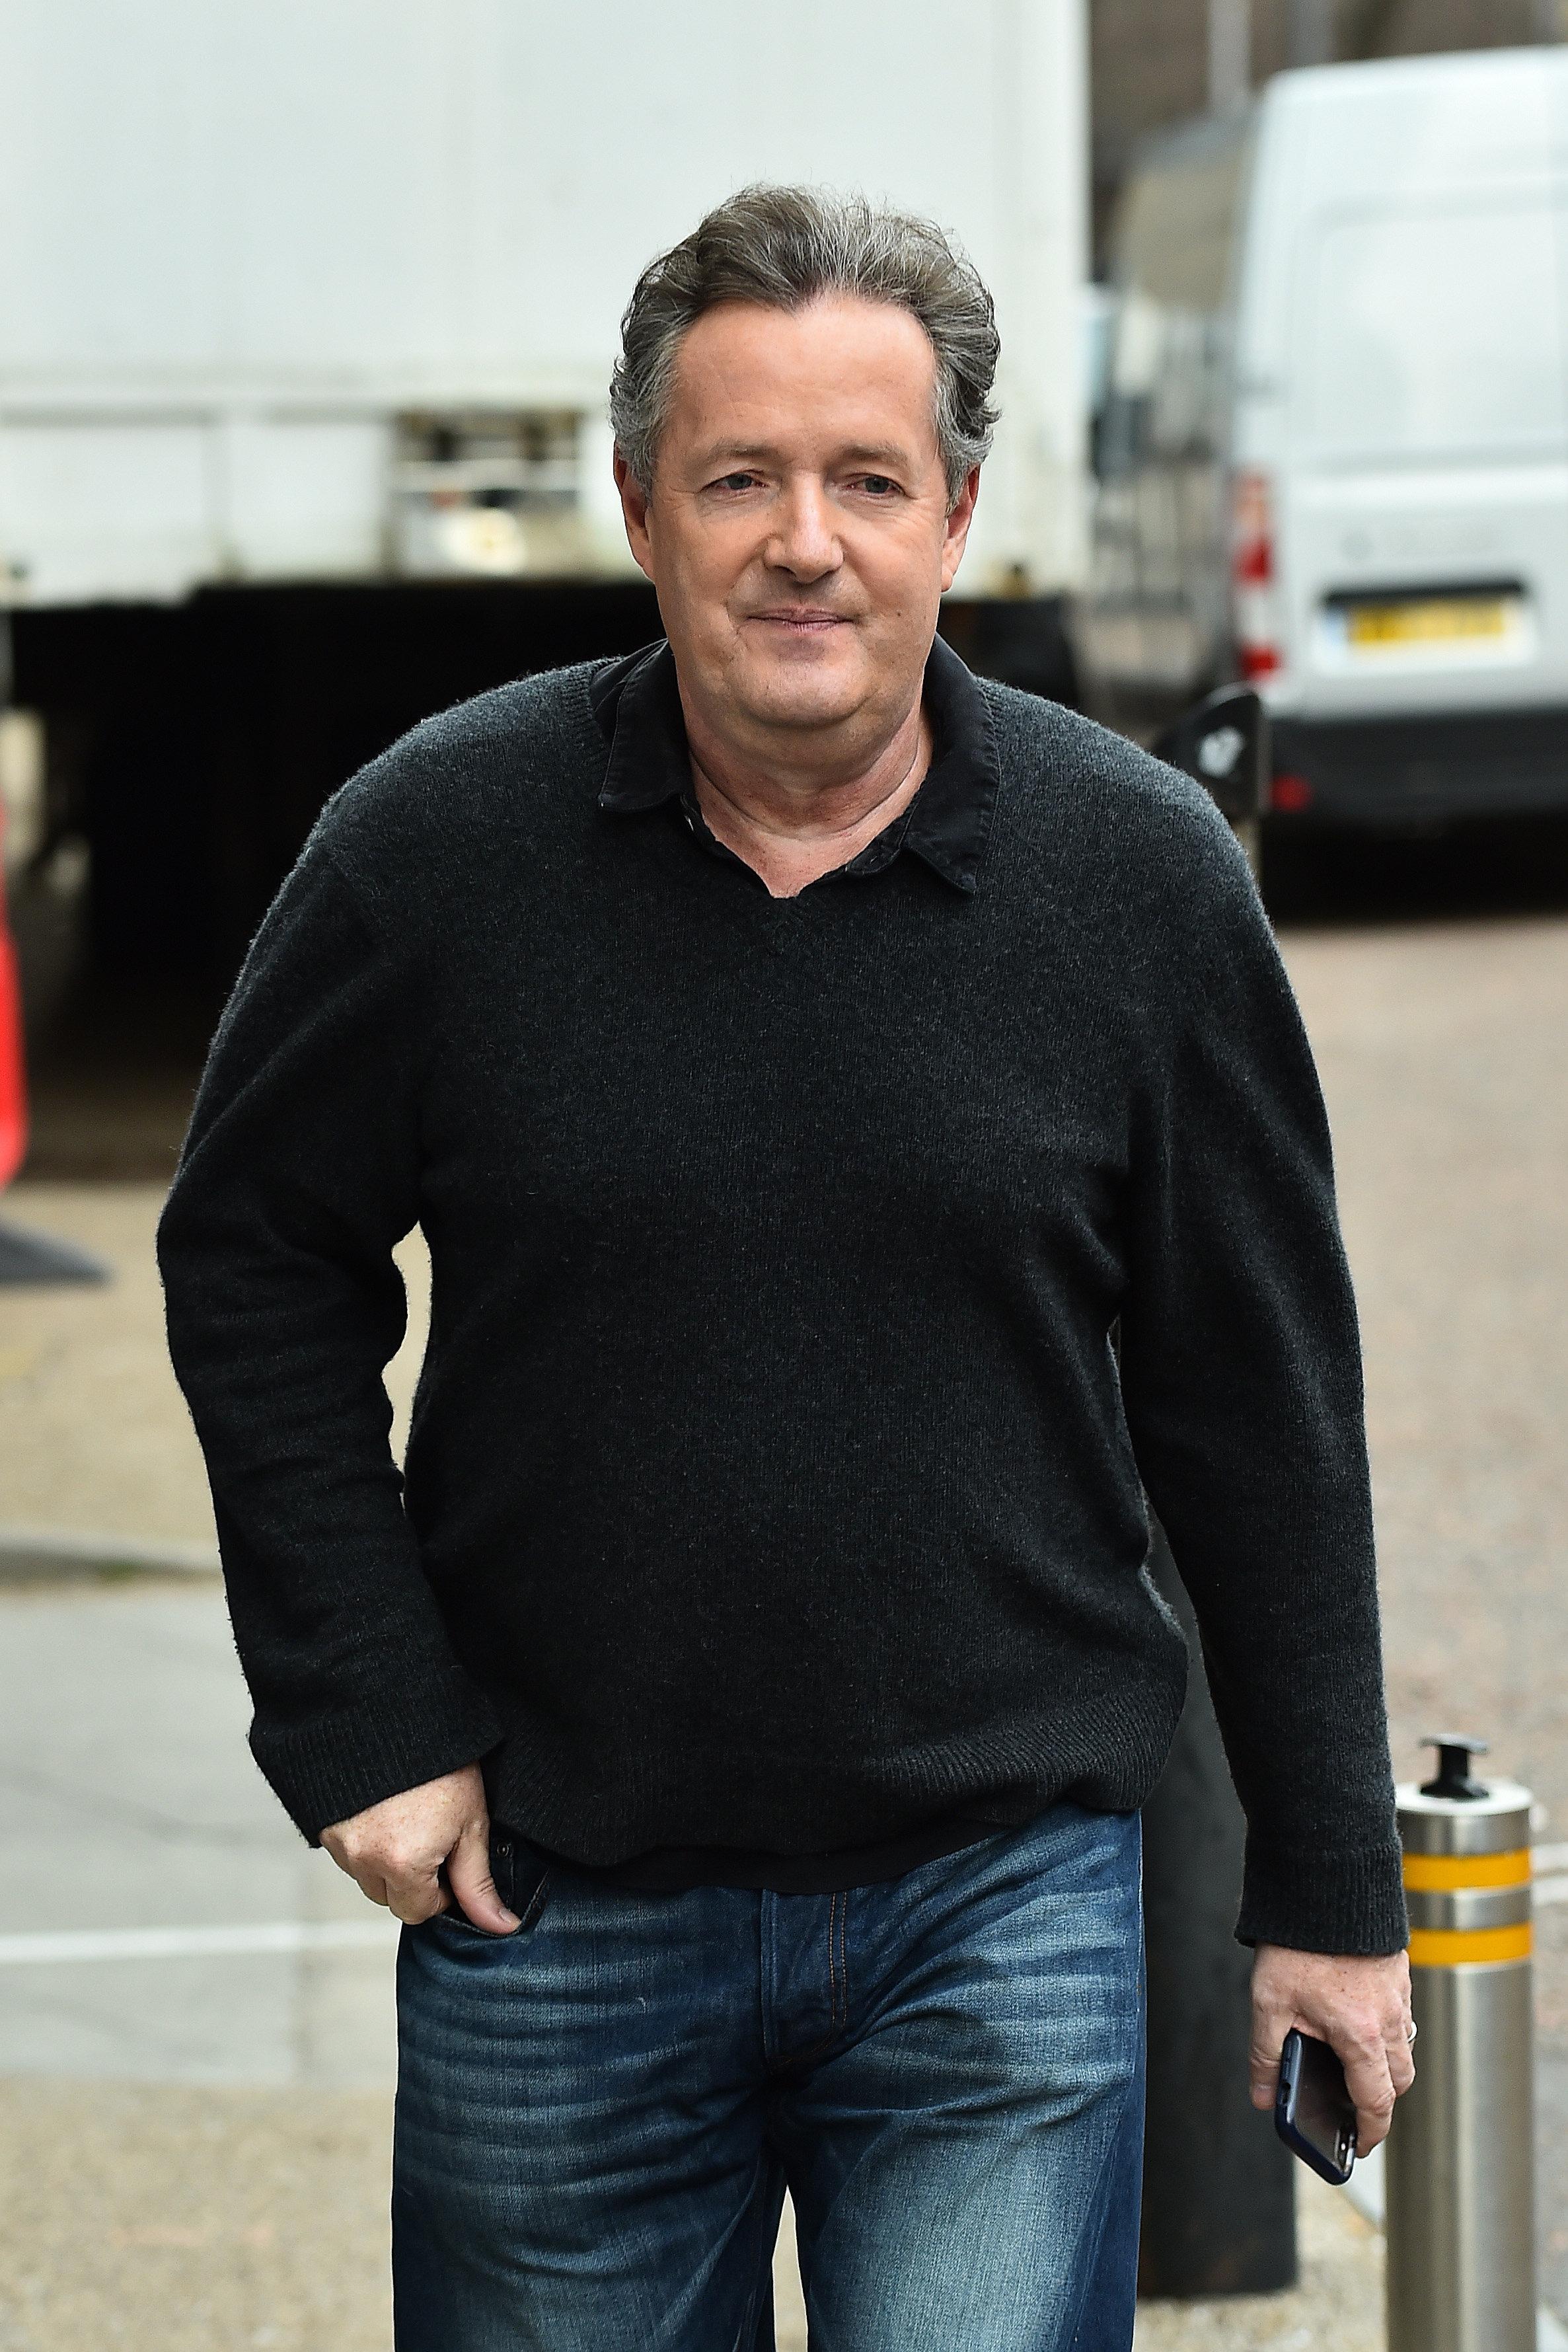 Piers Morgan Named NME's Villain Of The Year At 2018 Awards